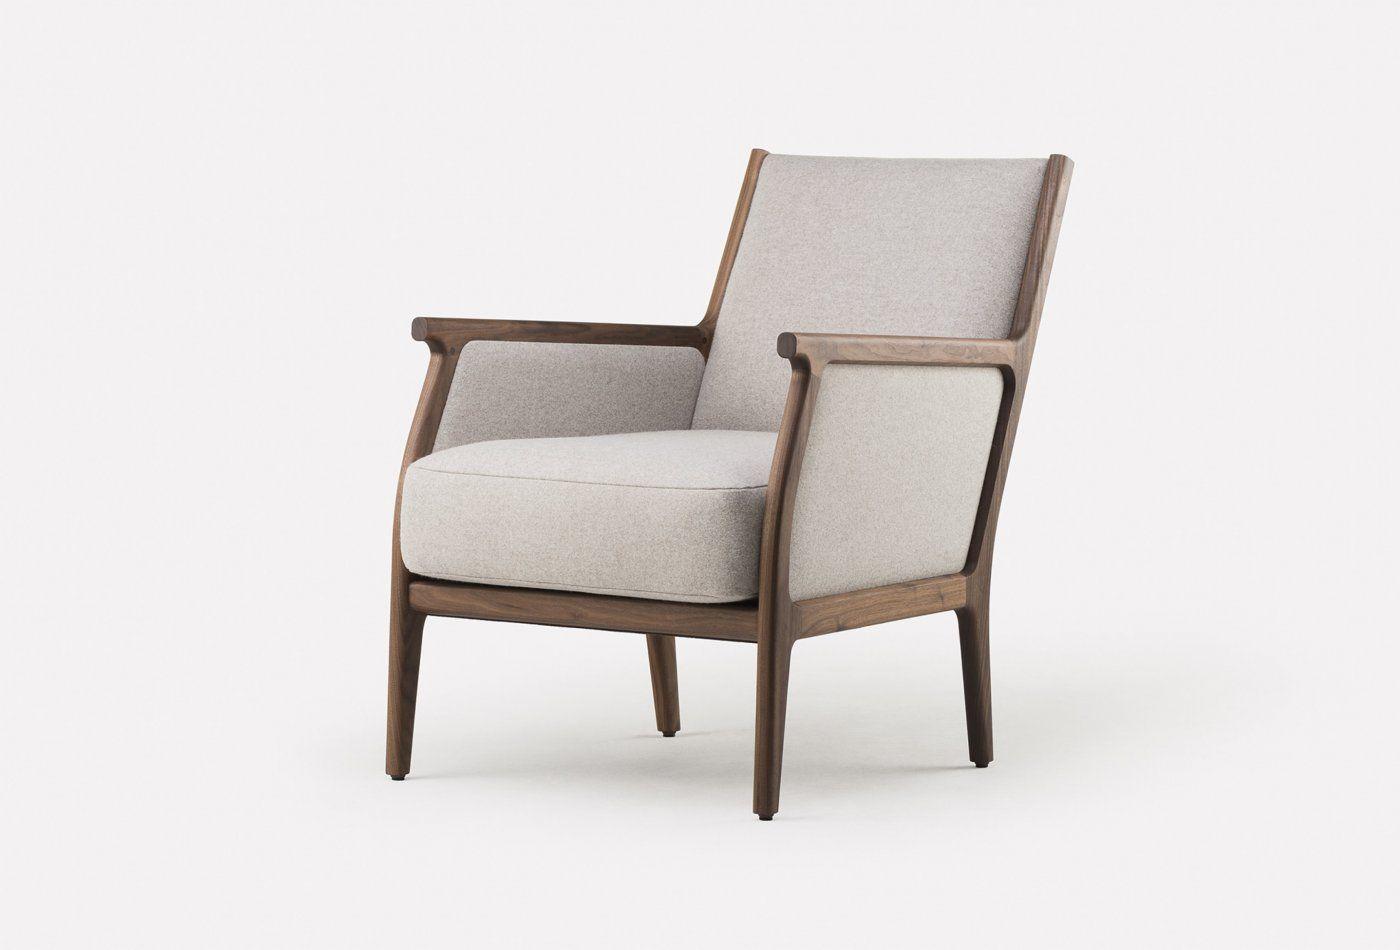 matthew hilton lounge chair. Viewing Matthew Hilton 389 Mira Lounge Chair Product